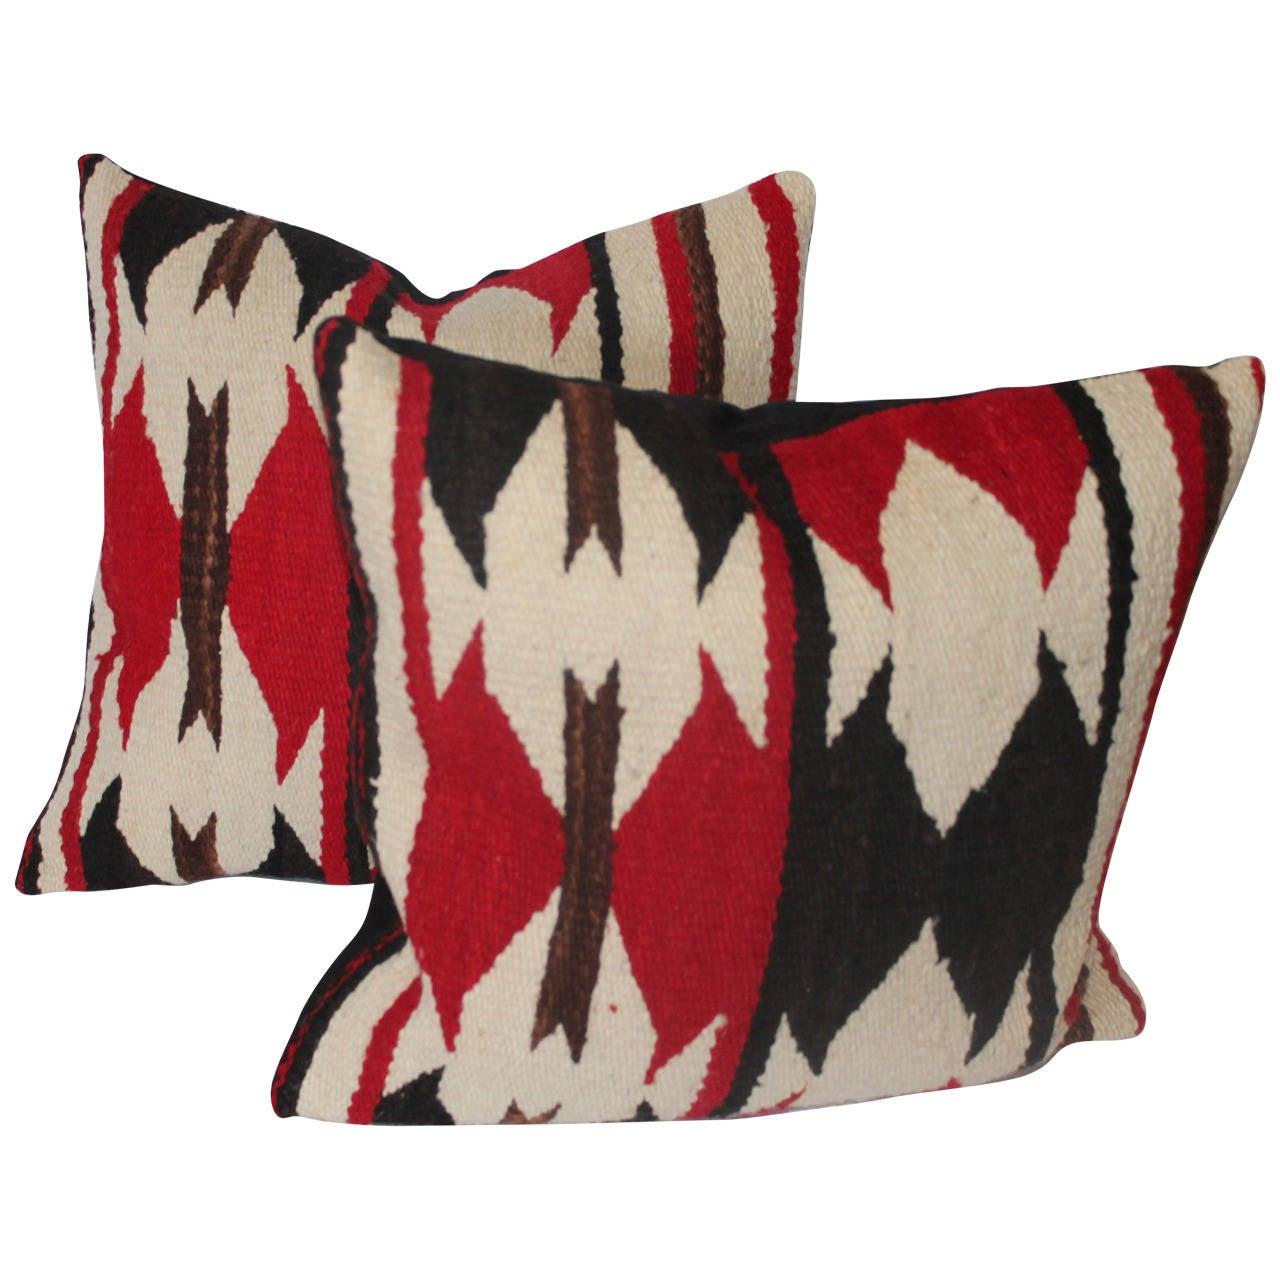 Pair Of Navajo Indian Weaving Geometric Pillows At 1stdibs